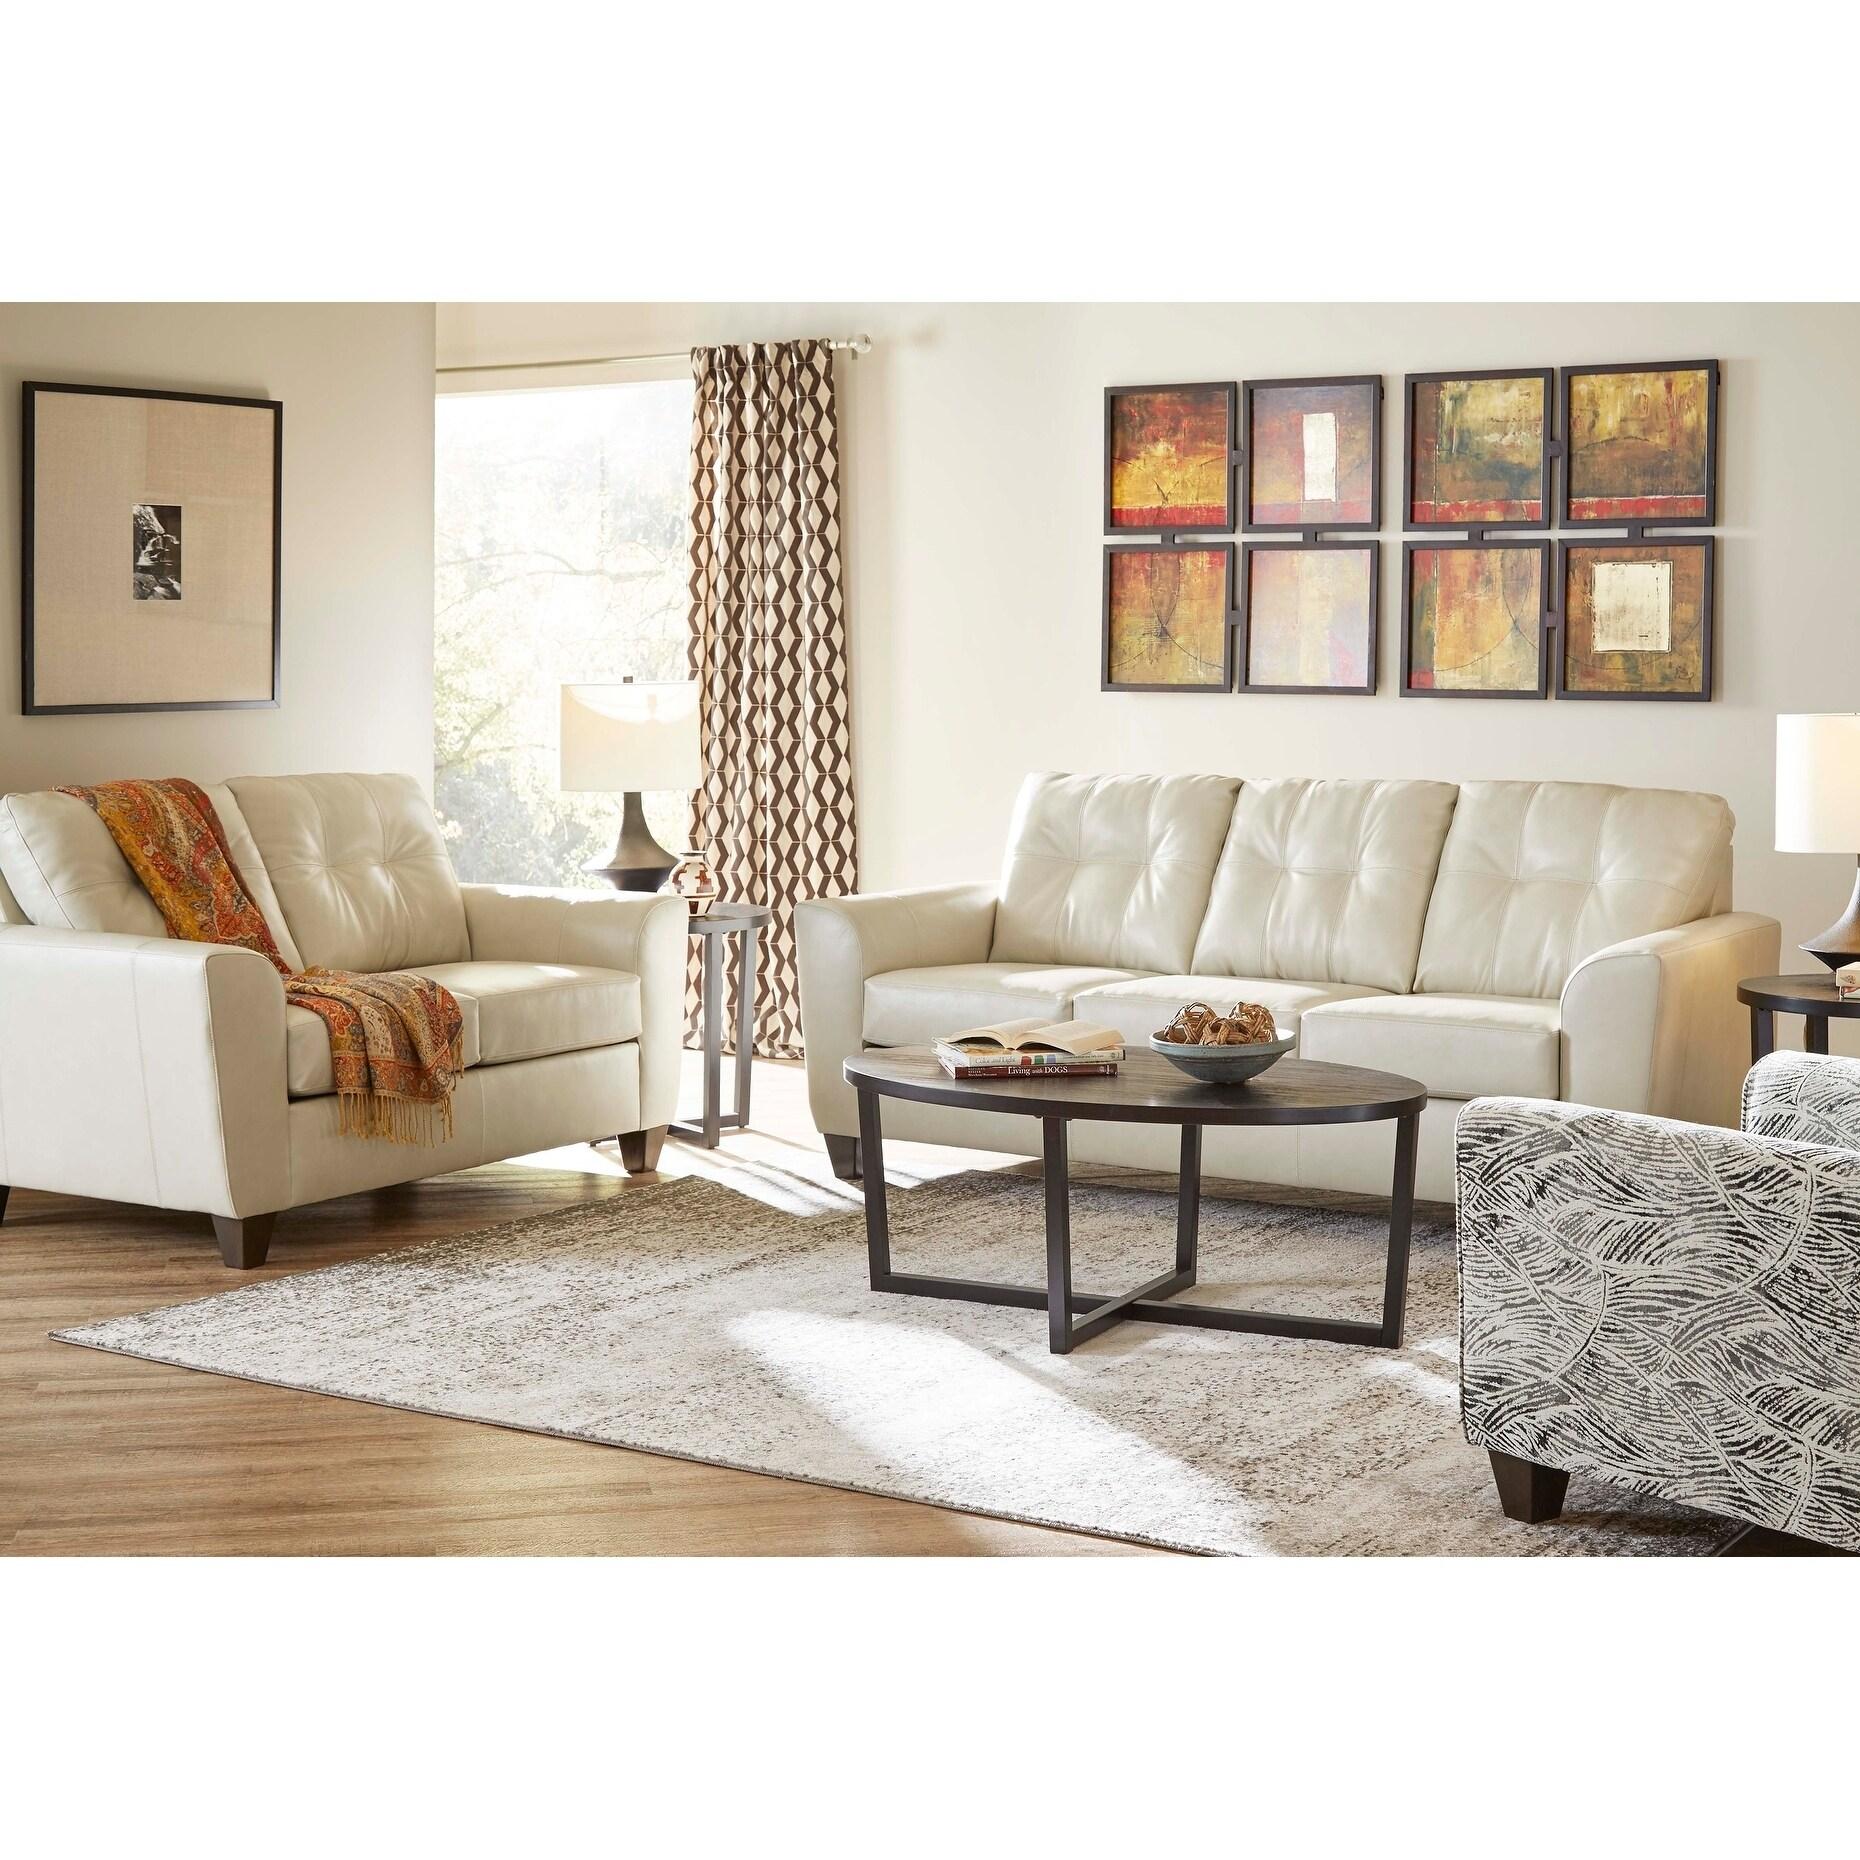 Hays Top Grain Leather Sofa and Loveseat Set